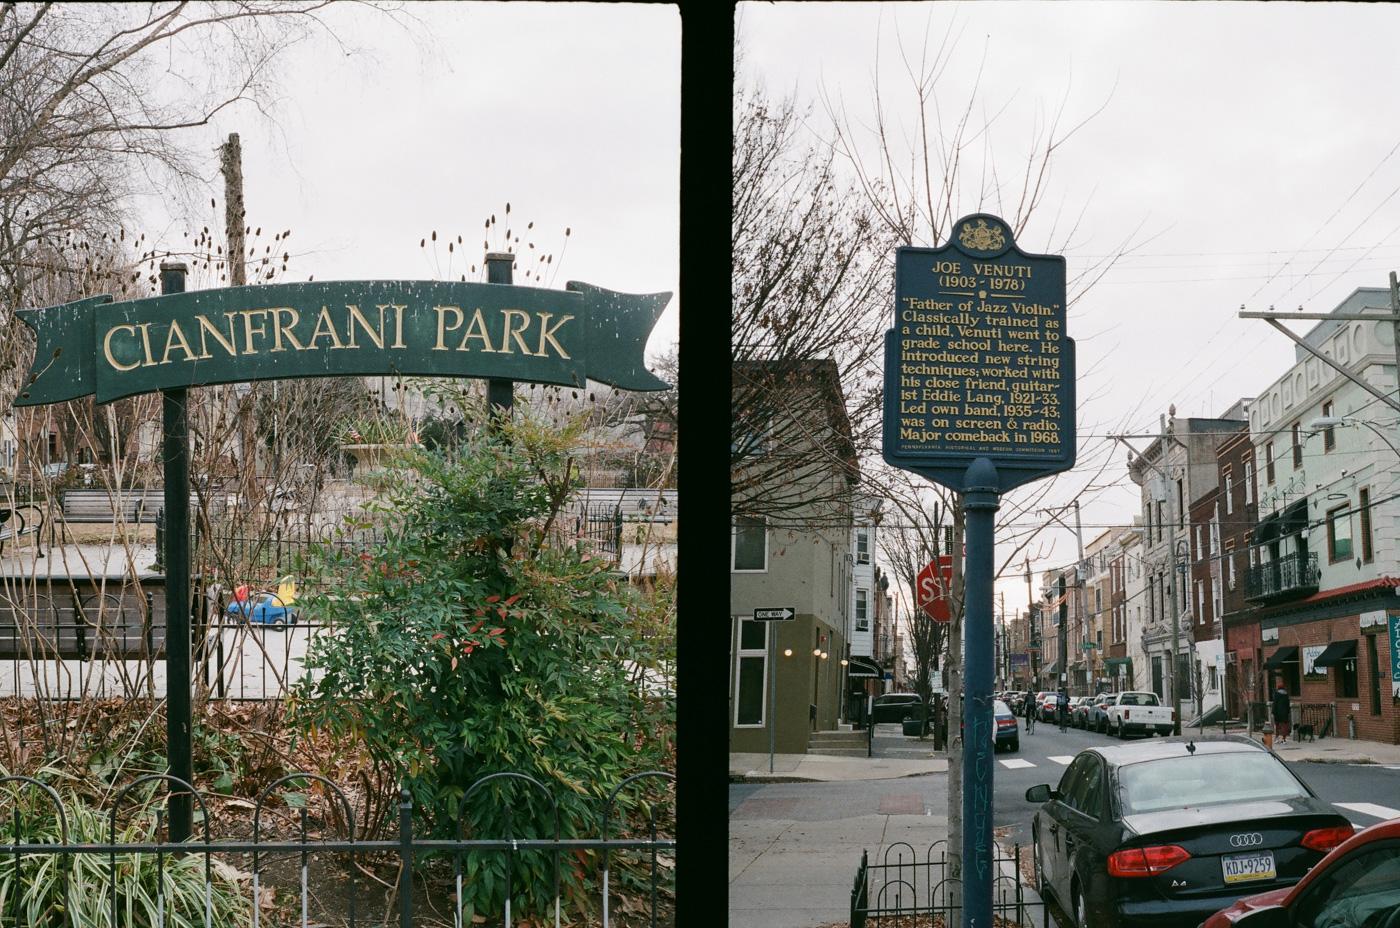 Cianfrani Park and Joe Venuti Historical Marker